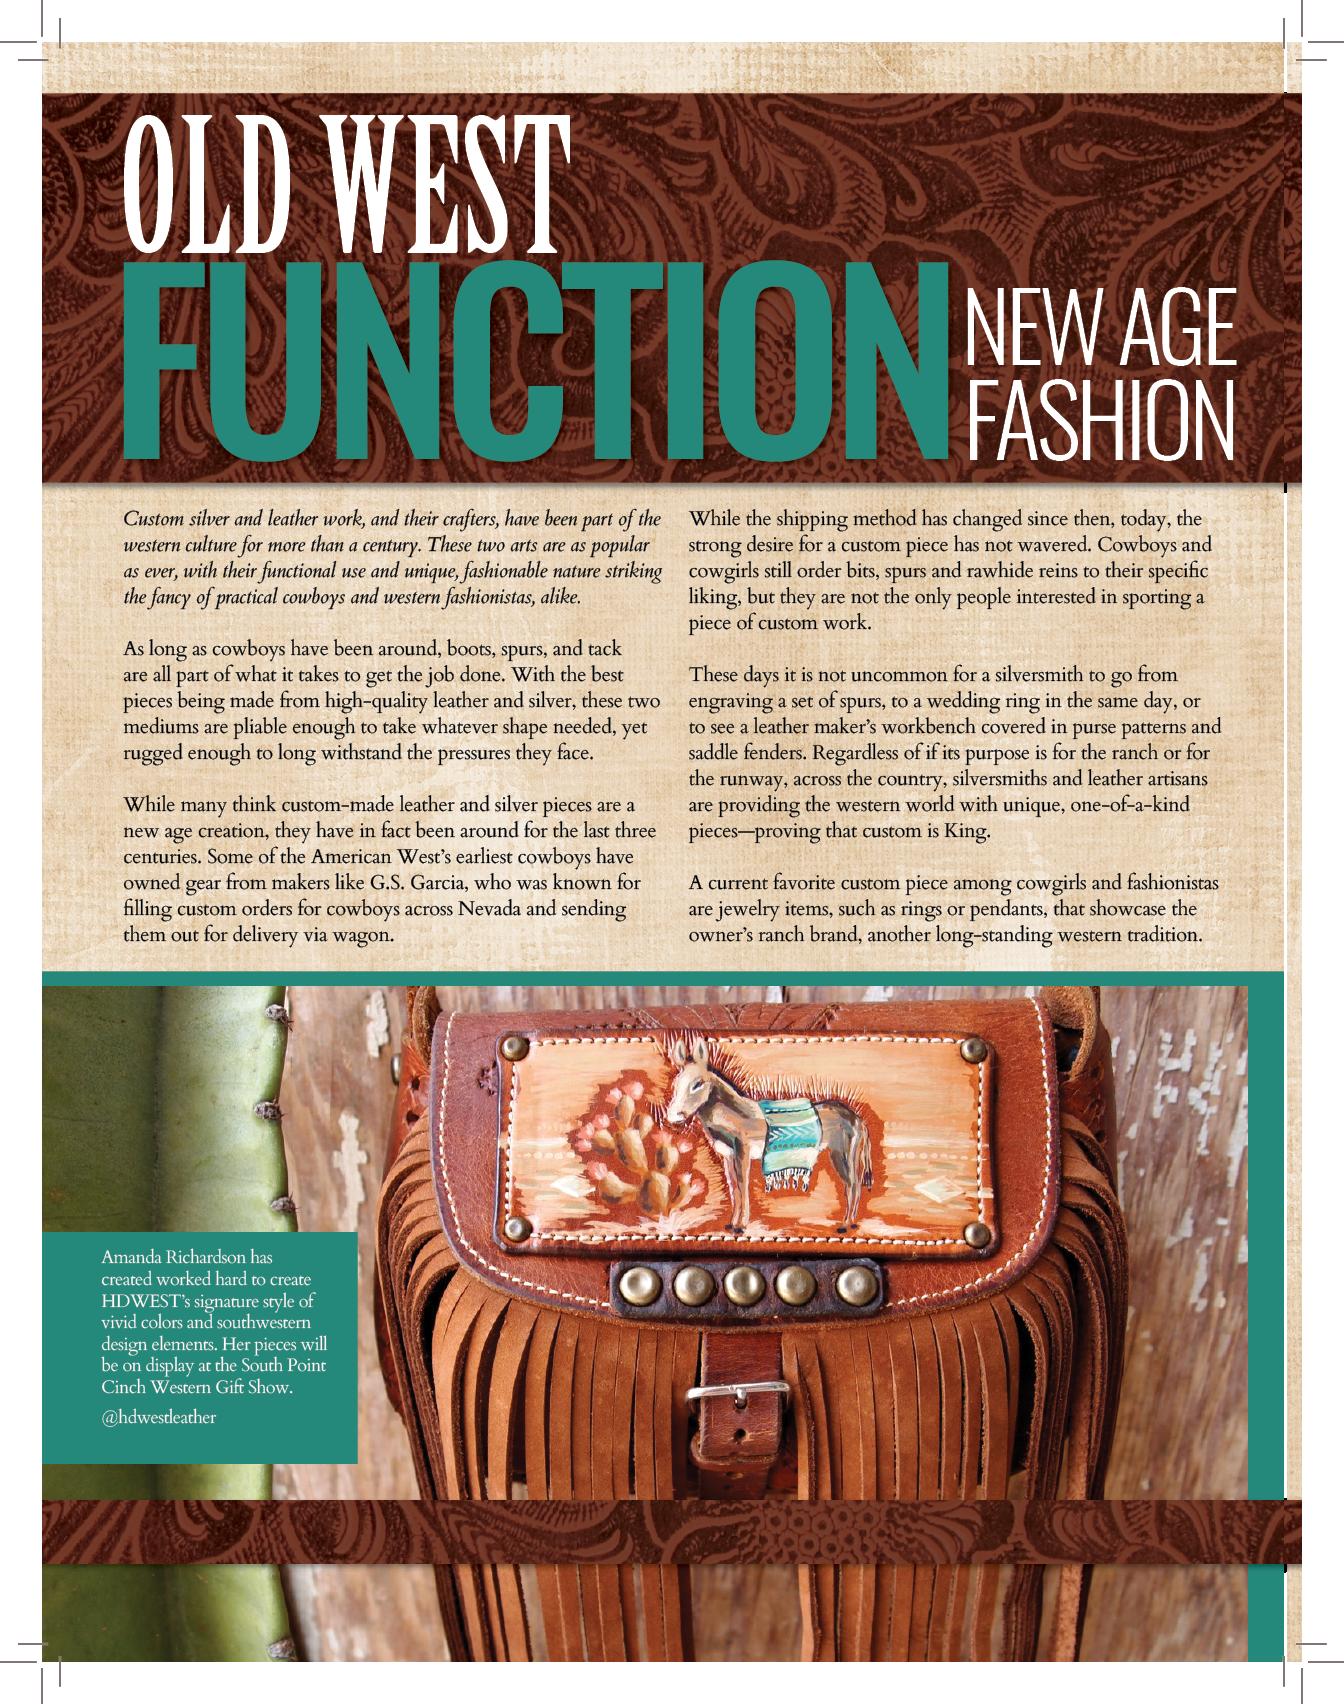 Western Runway Magazine - November 2017Old West Function, New Age Fashion